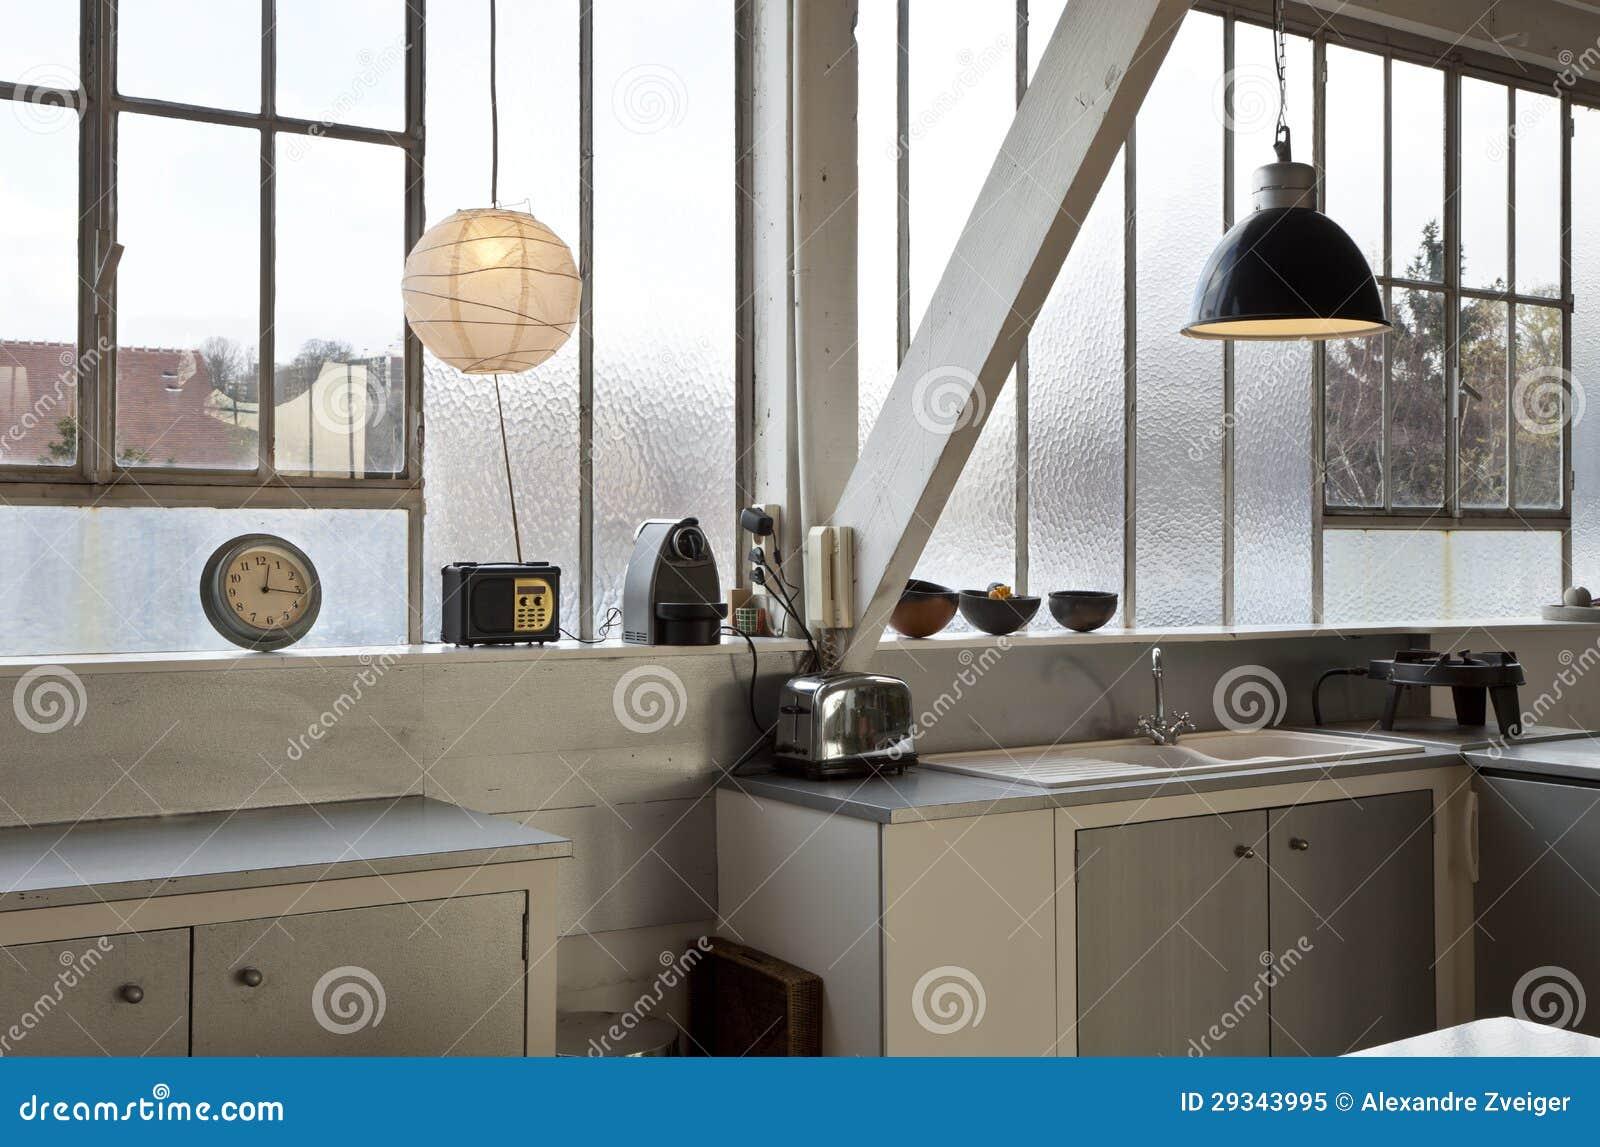 Loft Kitchen Interior Loft Kitchen Royalty Free Stock Photo Image 29343995